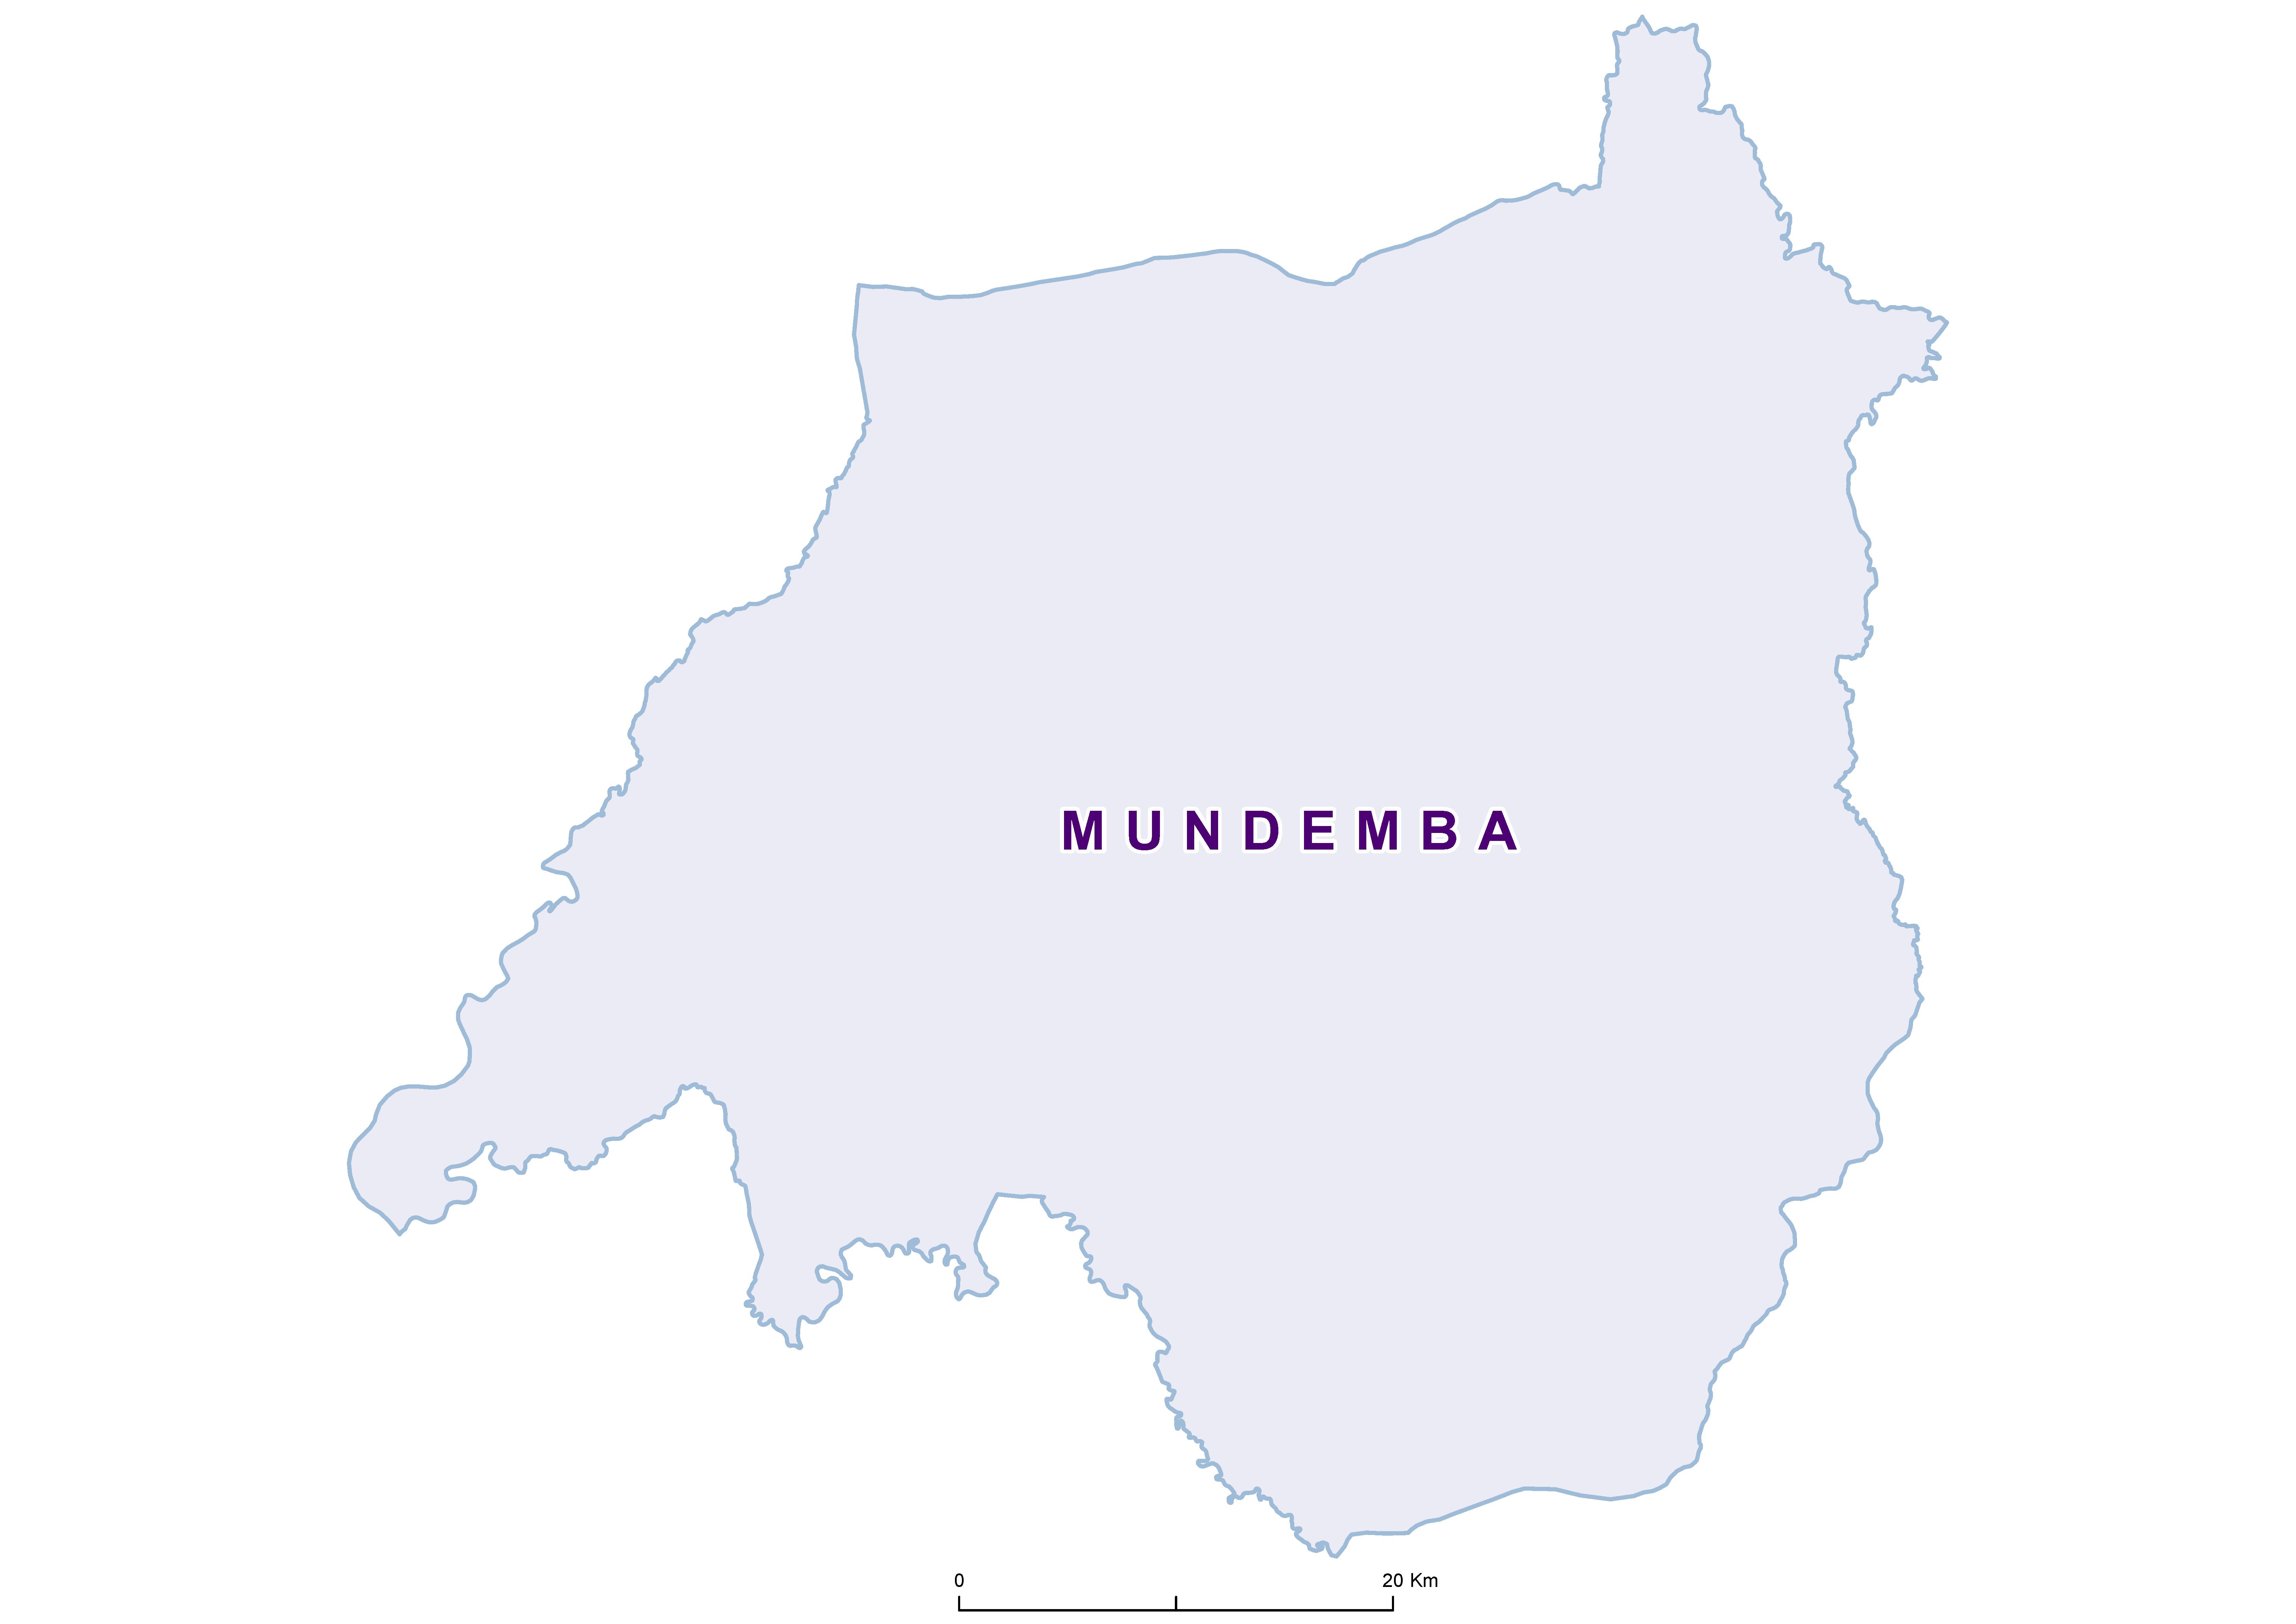 Mundemba Mean STH 20180001